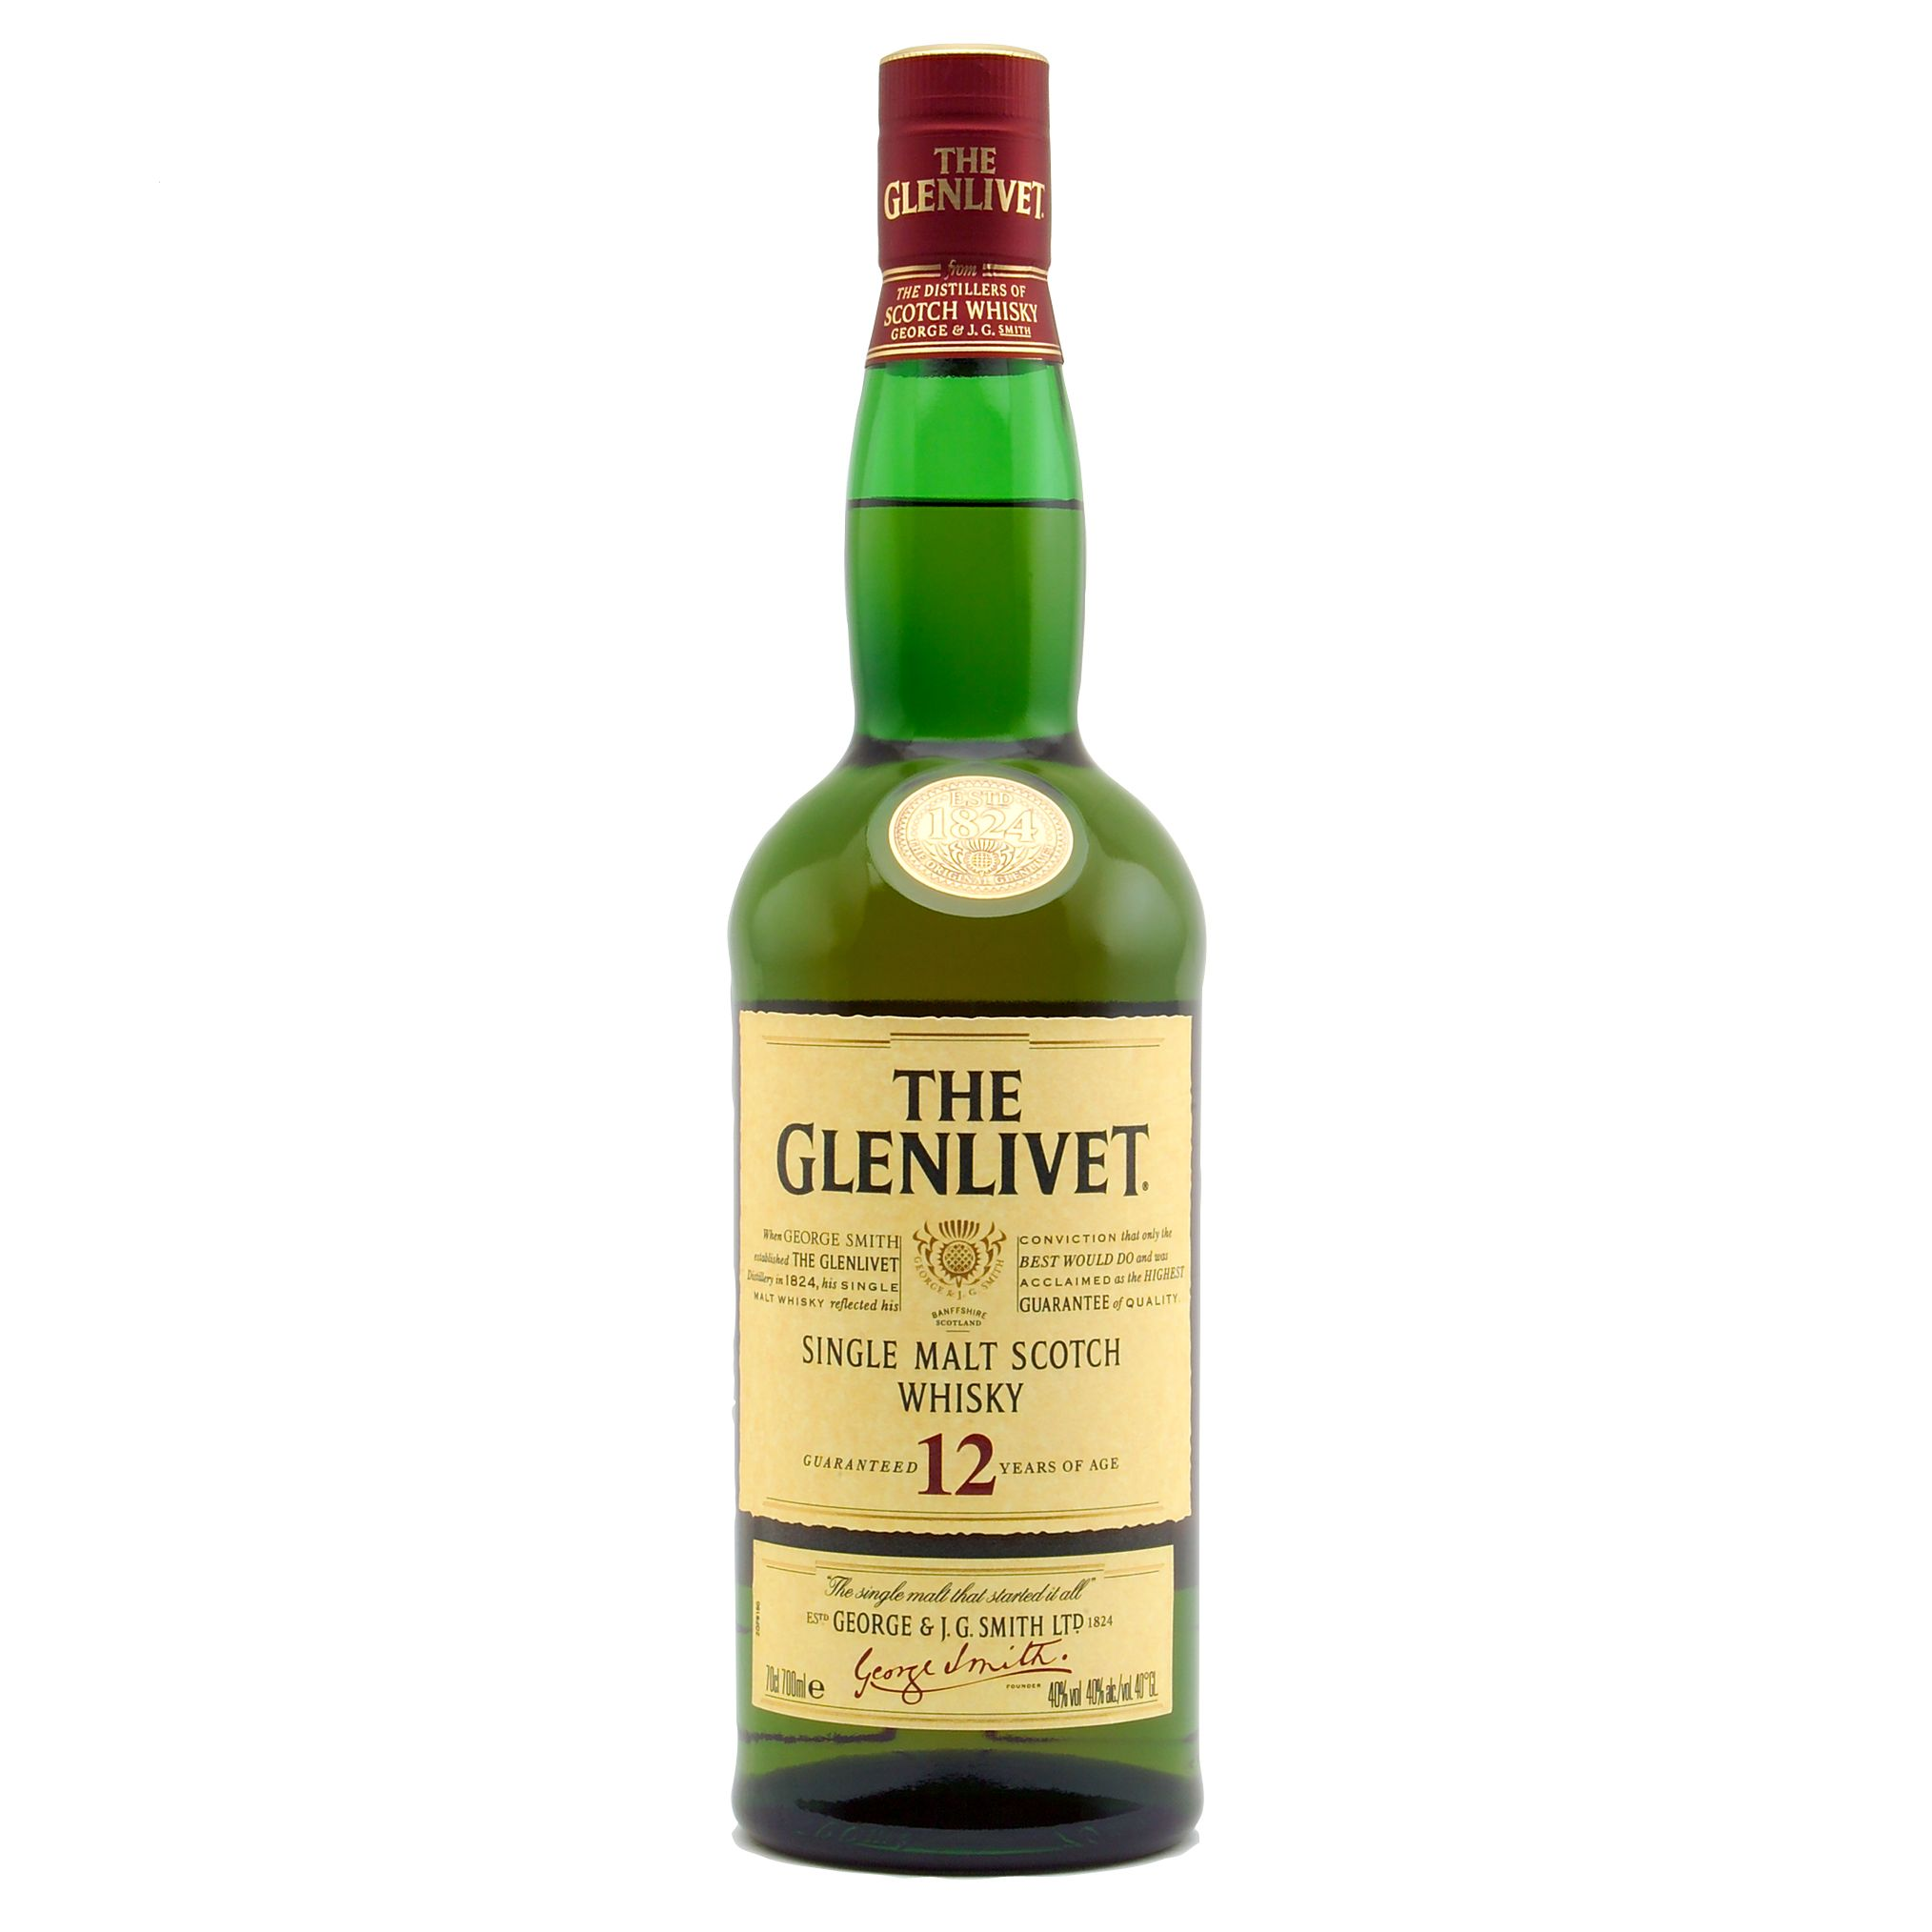 Glenlivet 12 Year Old Speyside Malt Whisky